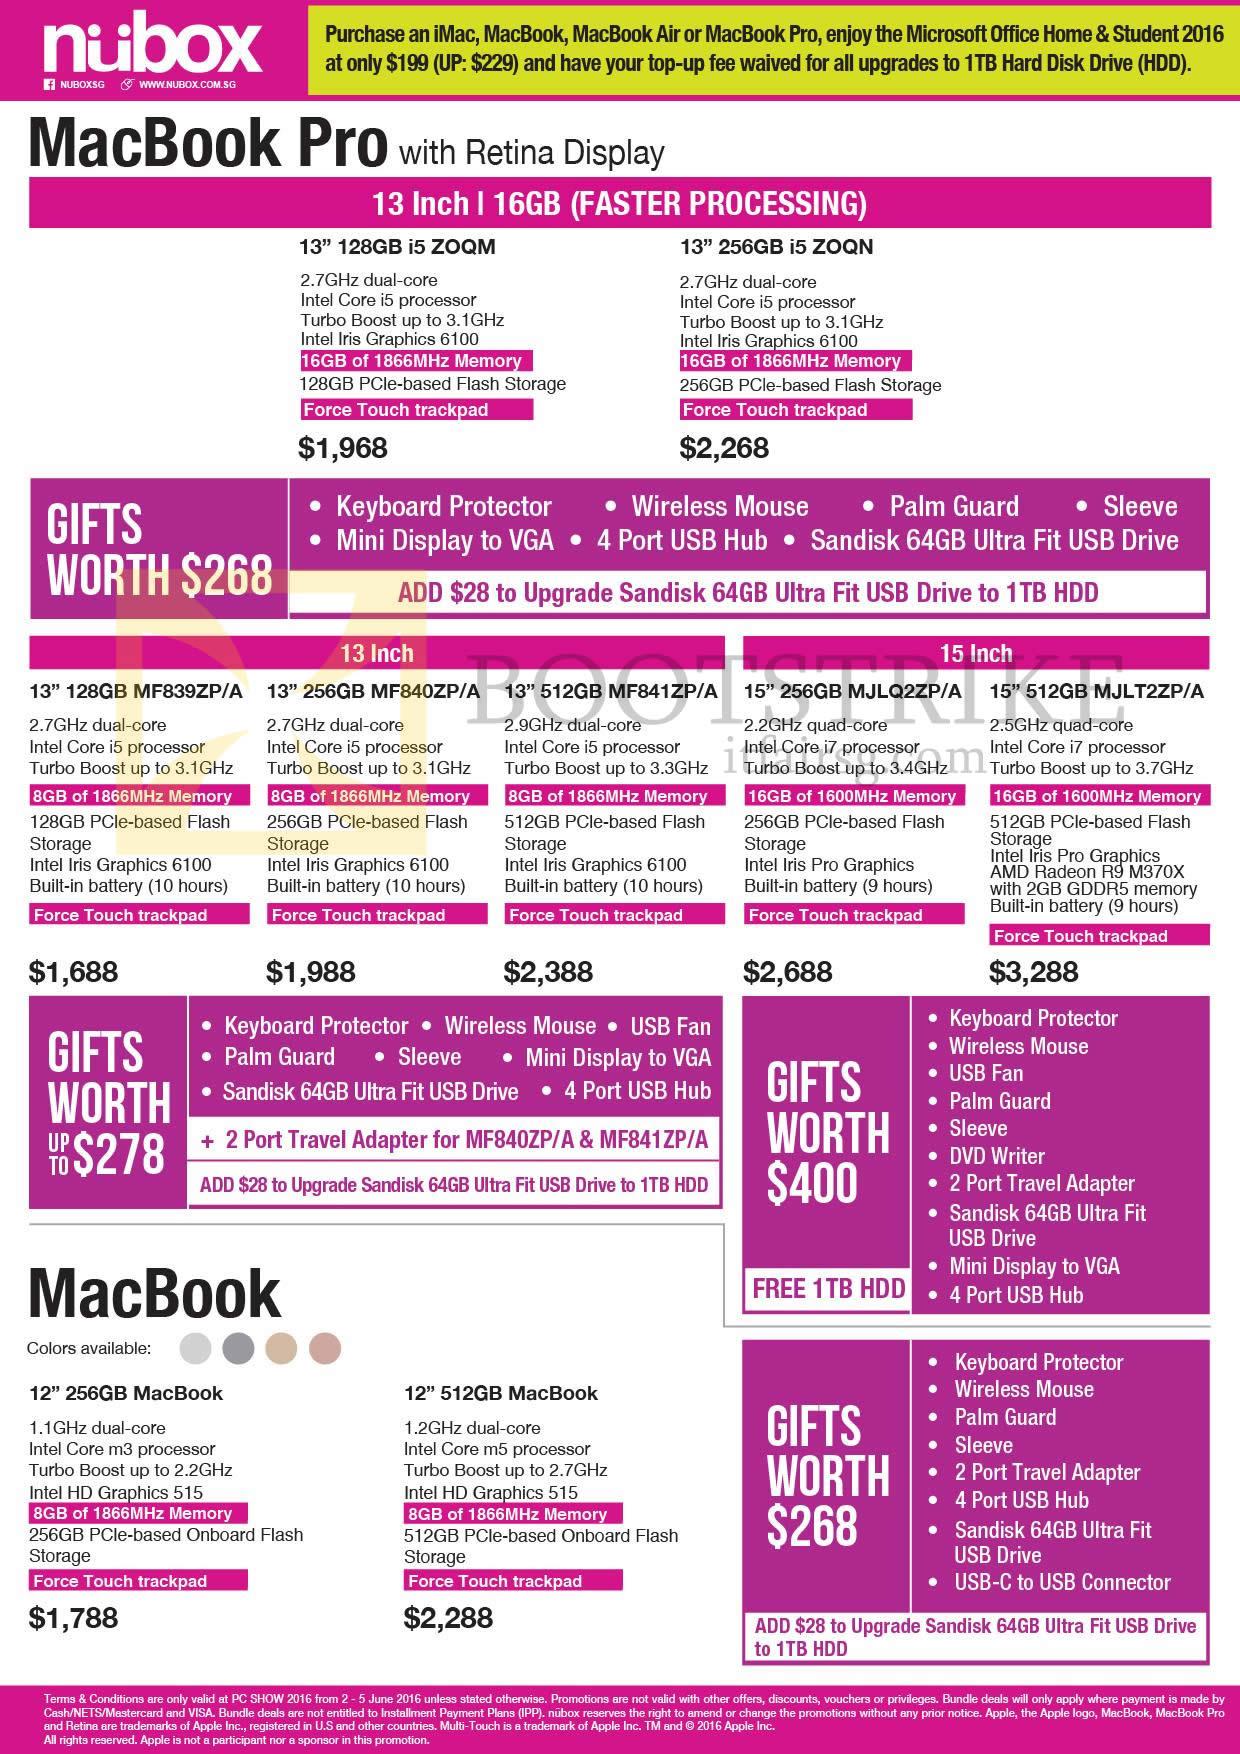 PC SHOW 2016 price list image brochure of Nubox Apple Macbook Pro With Retina Display Notebook Macbook